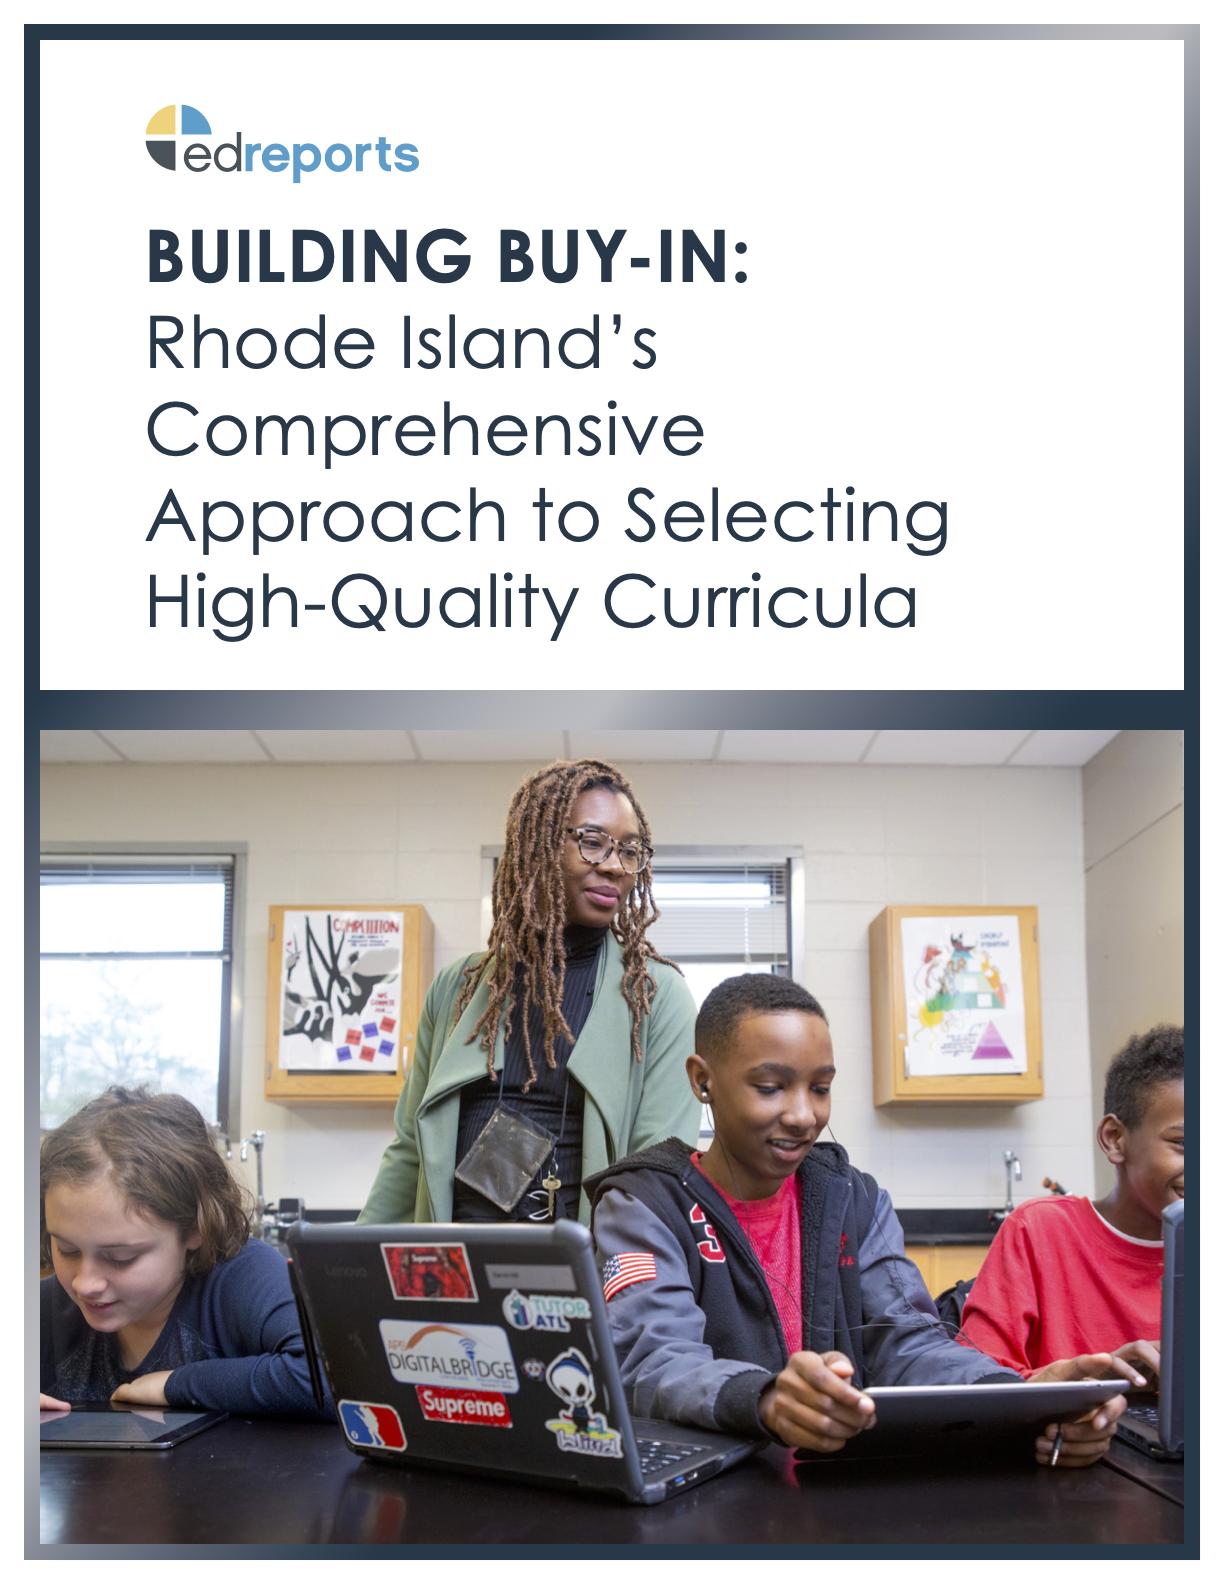 Building_Buy-In_1.png